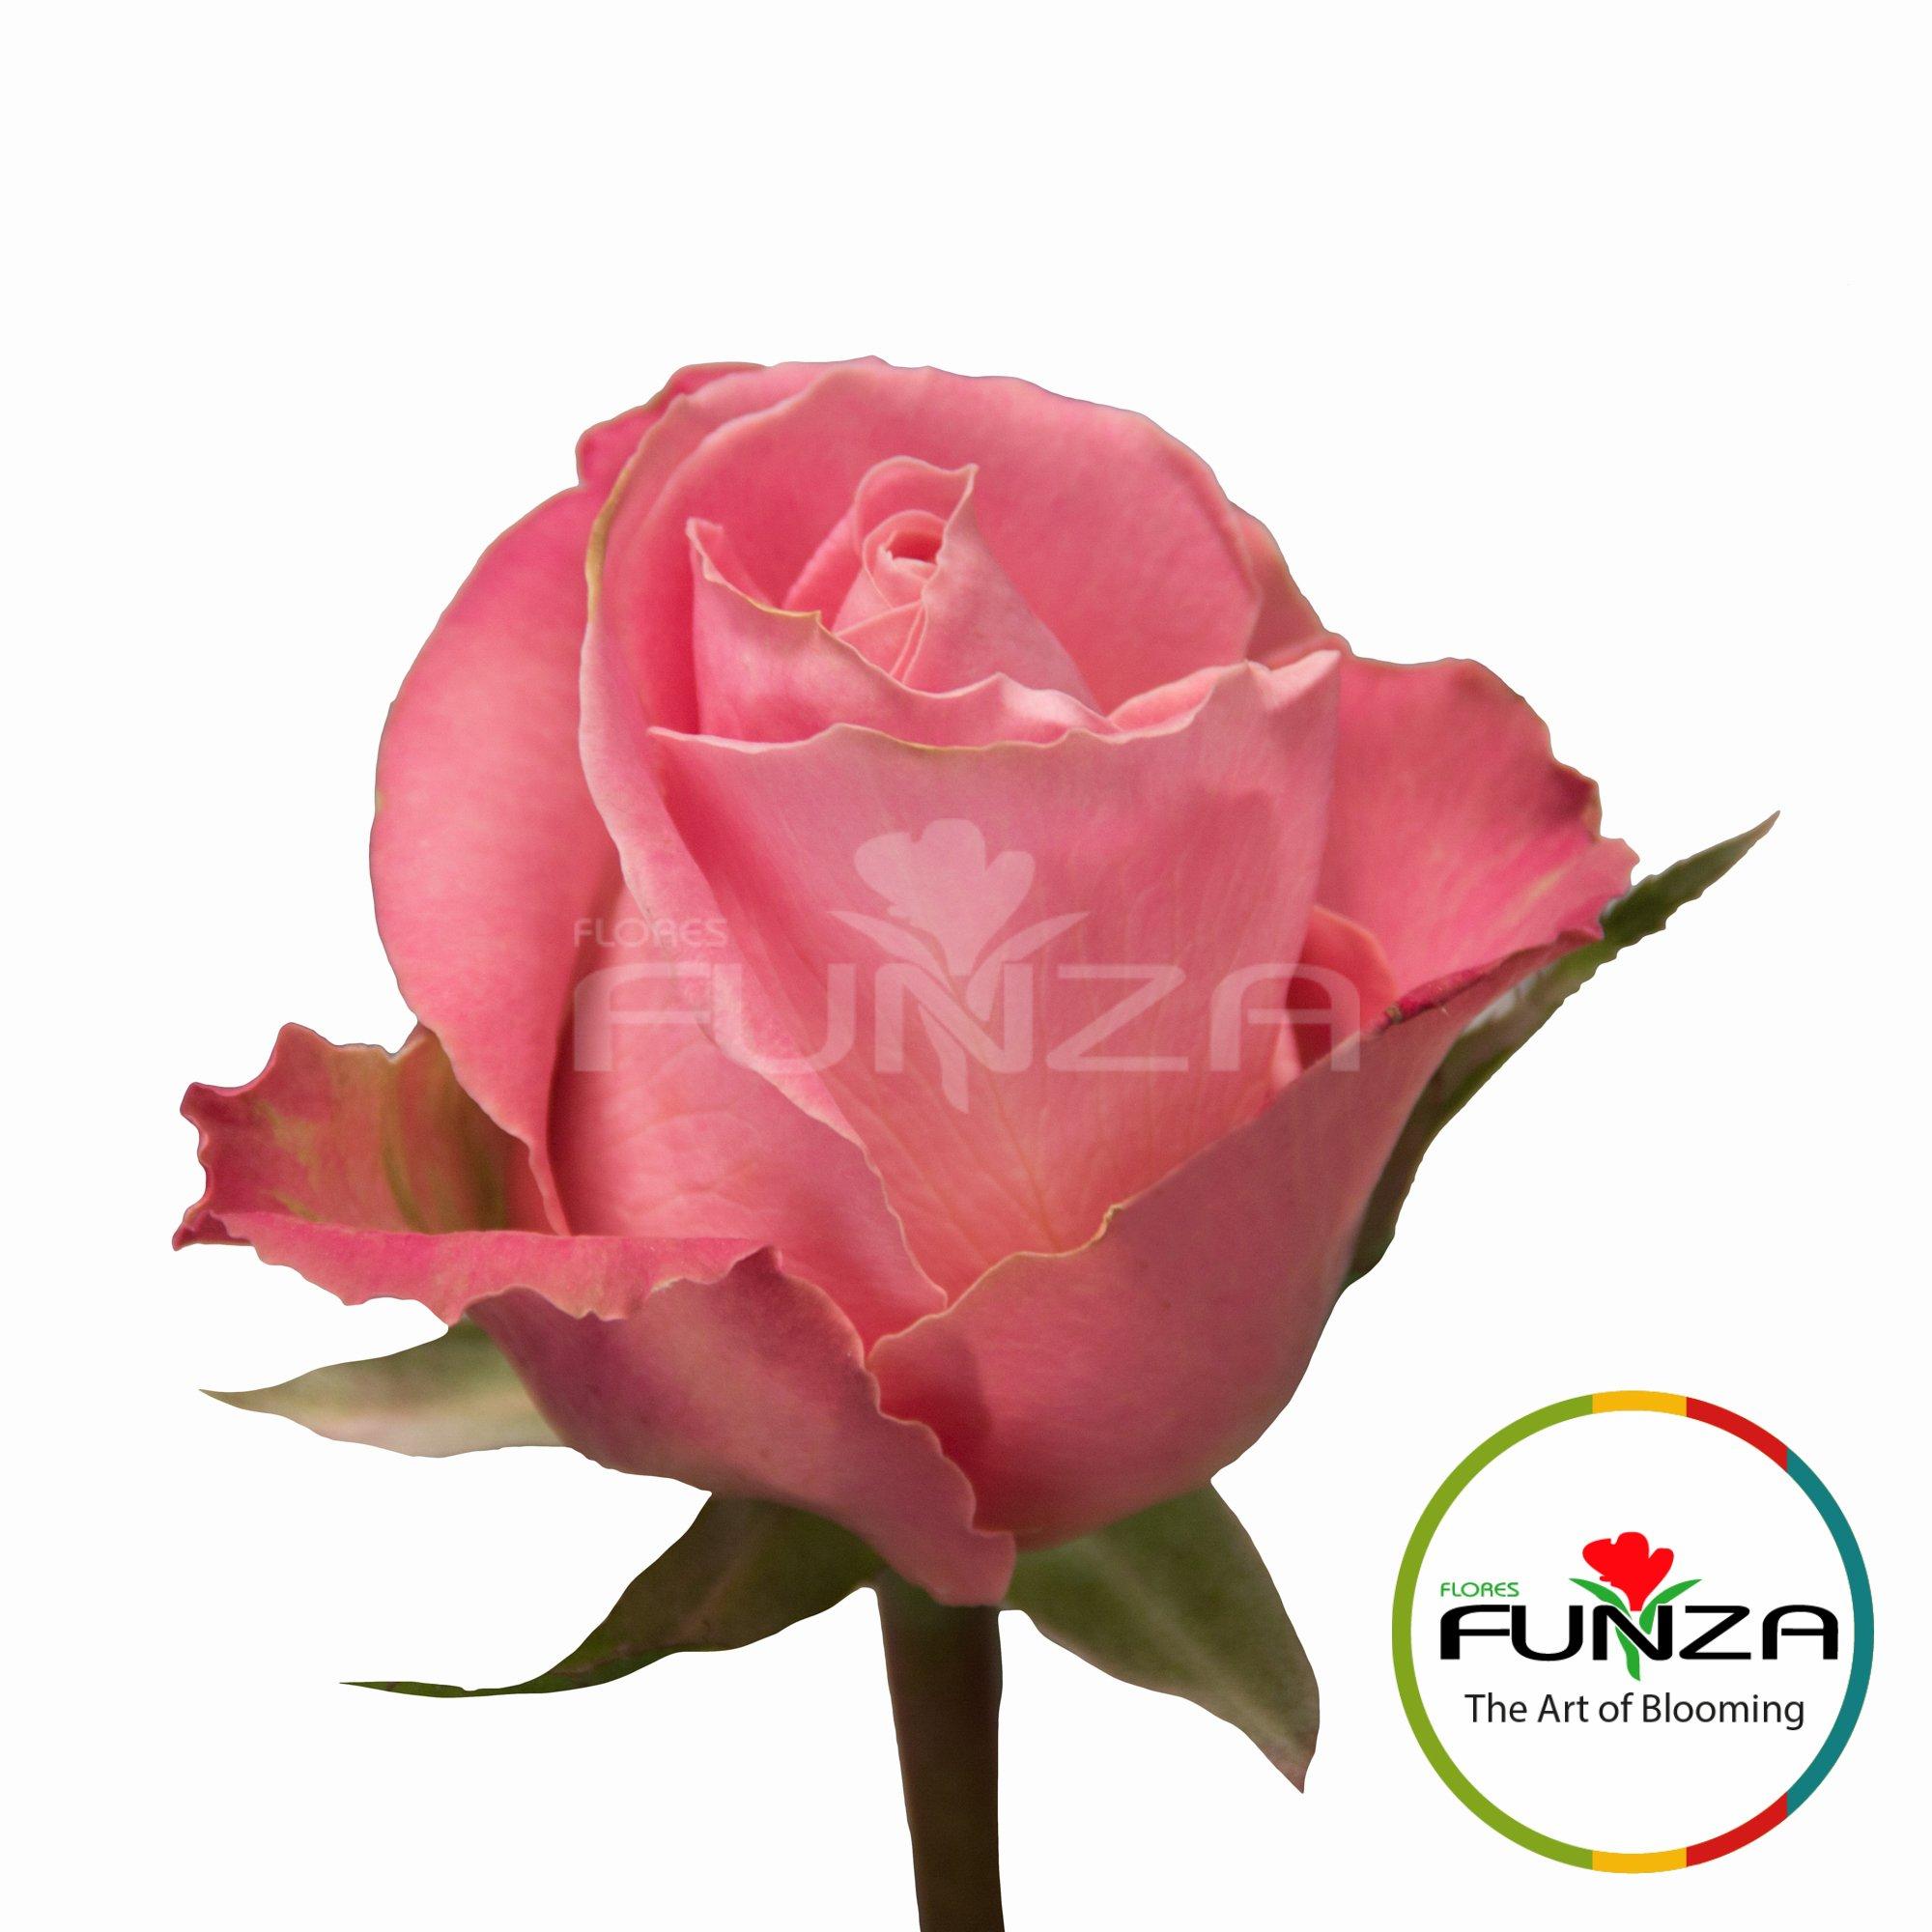 Hermosa (4) - Flores Funza